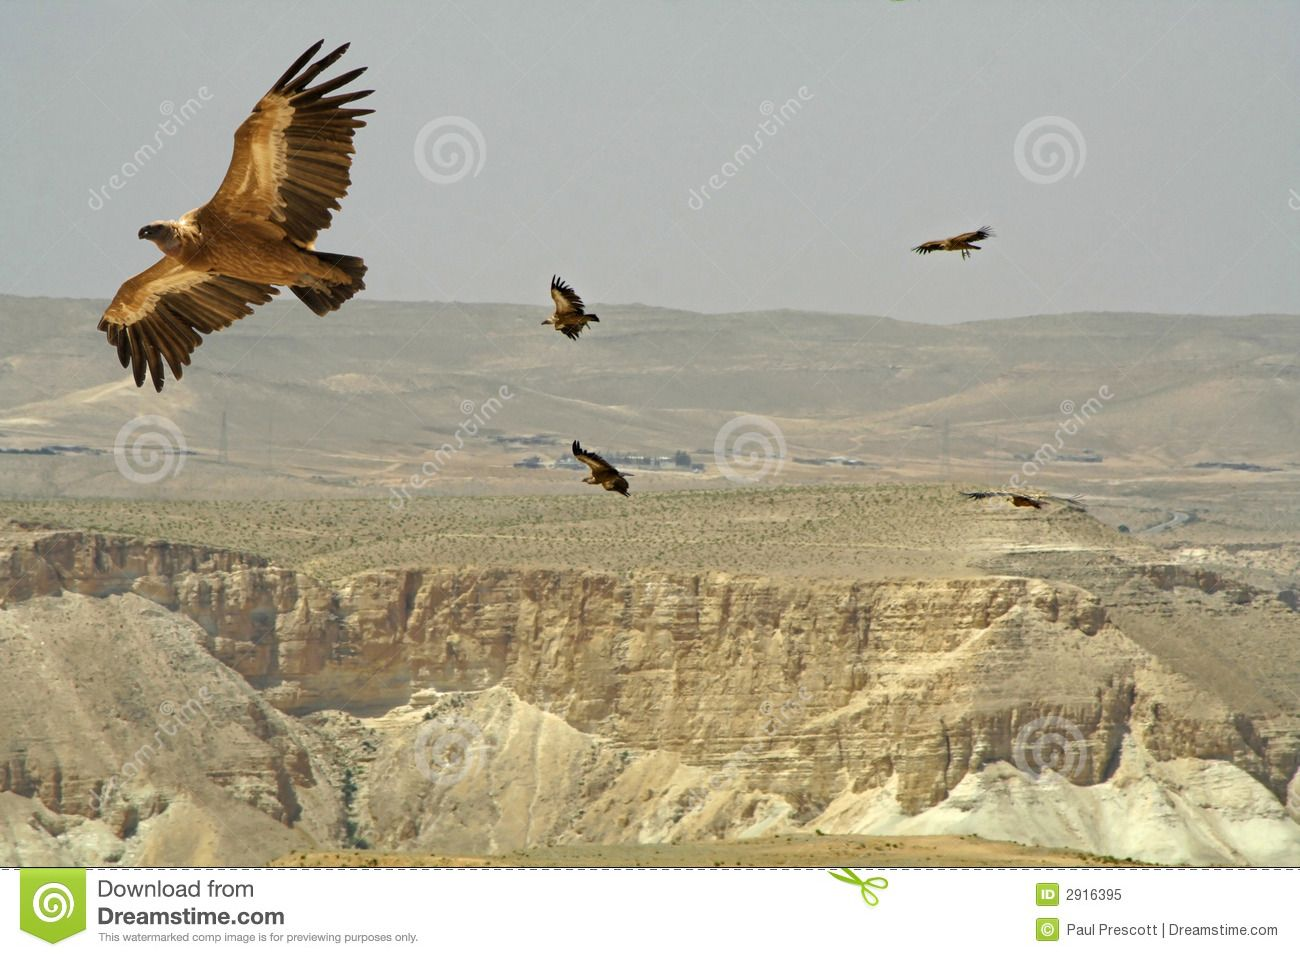 Birds Of Prey Desert Royalty Free Stock Photo  Image: 2916395